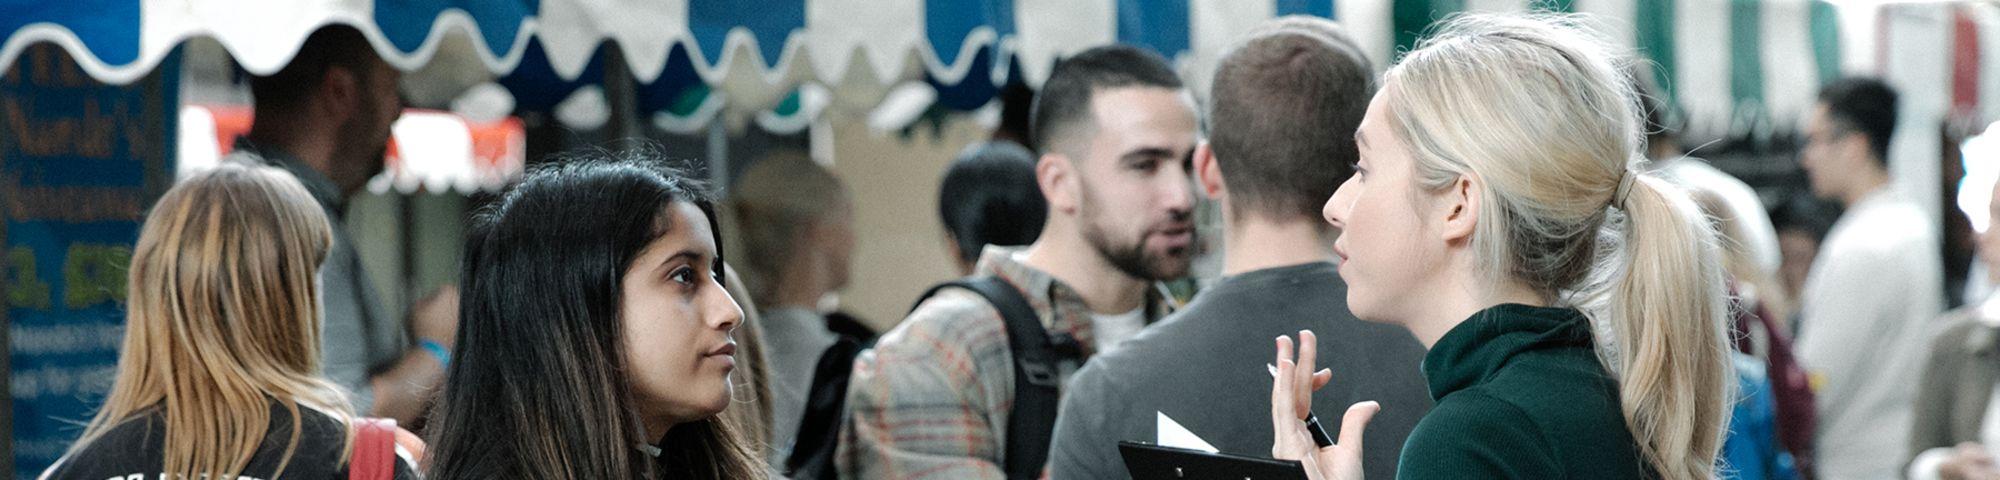 Student Careers | UAL